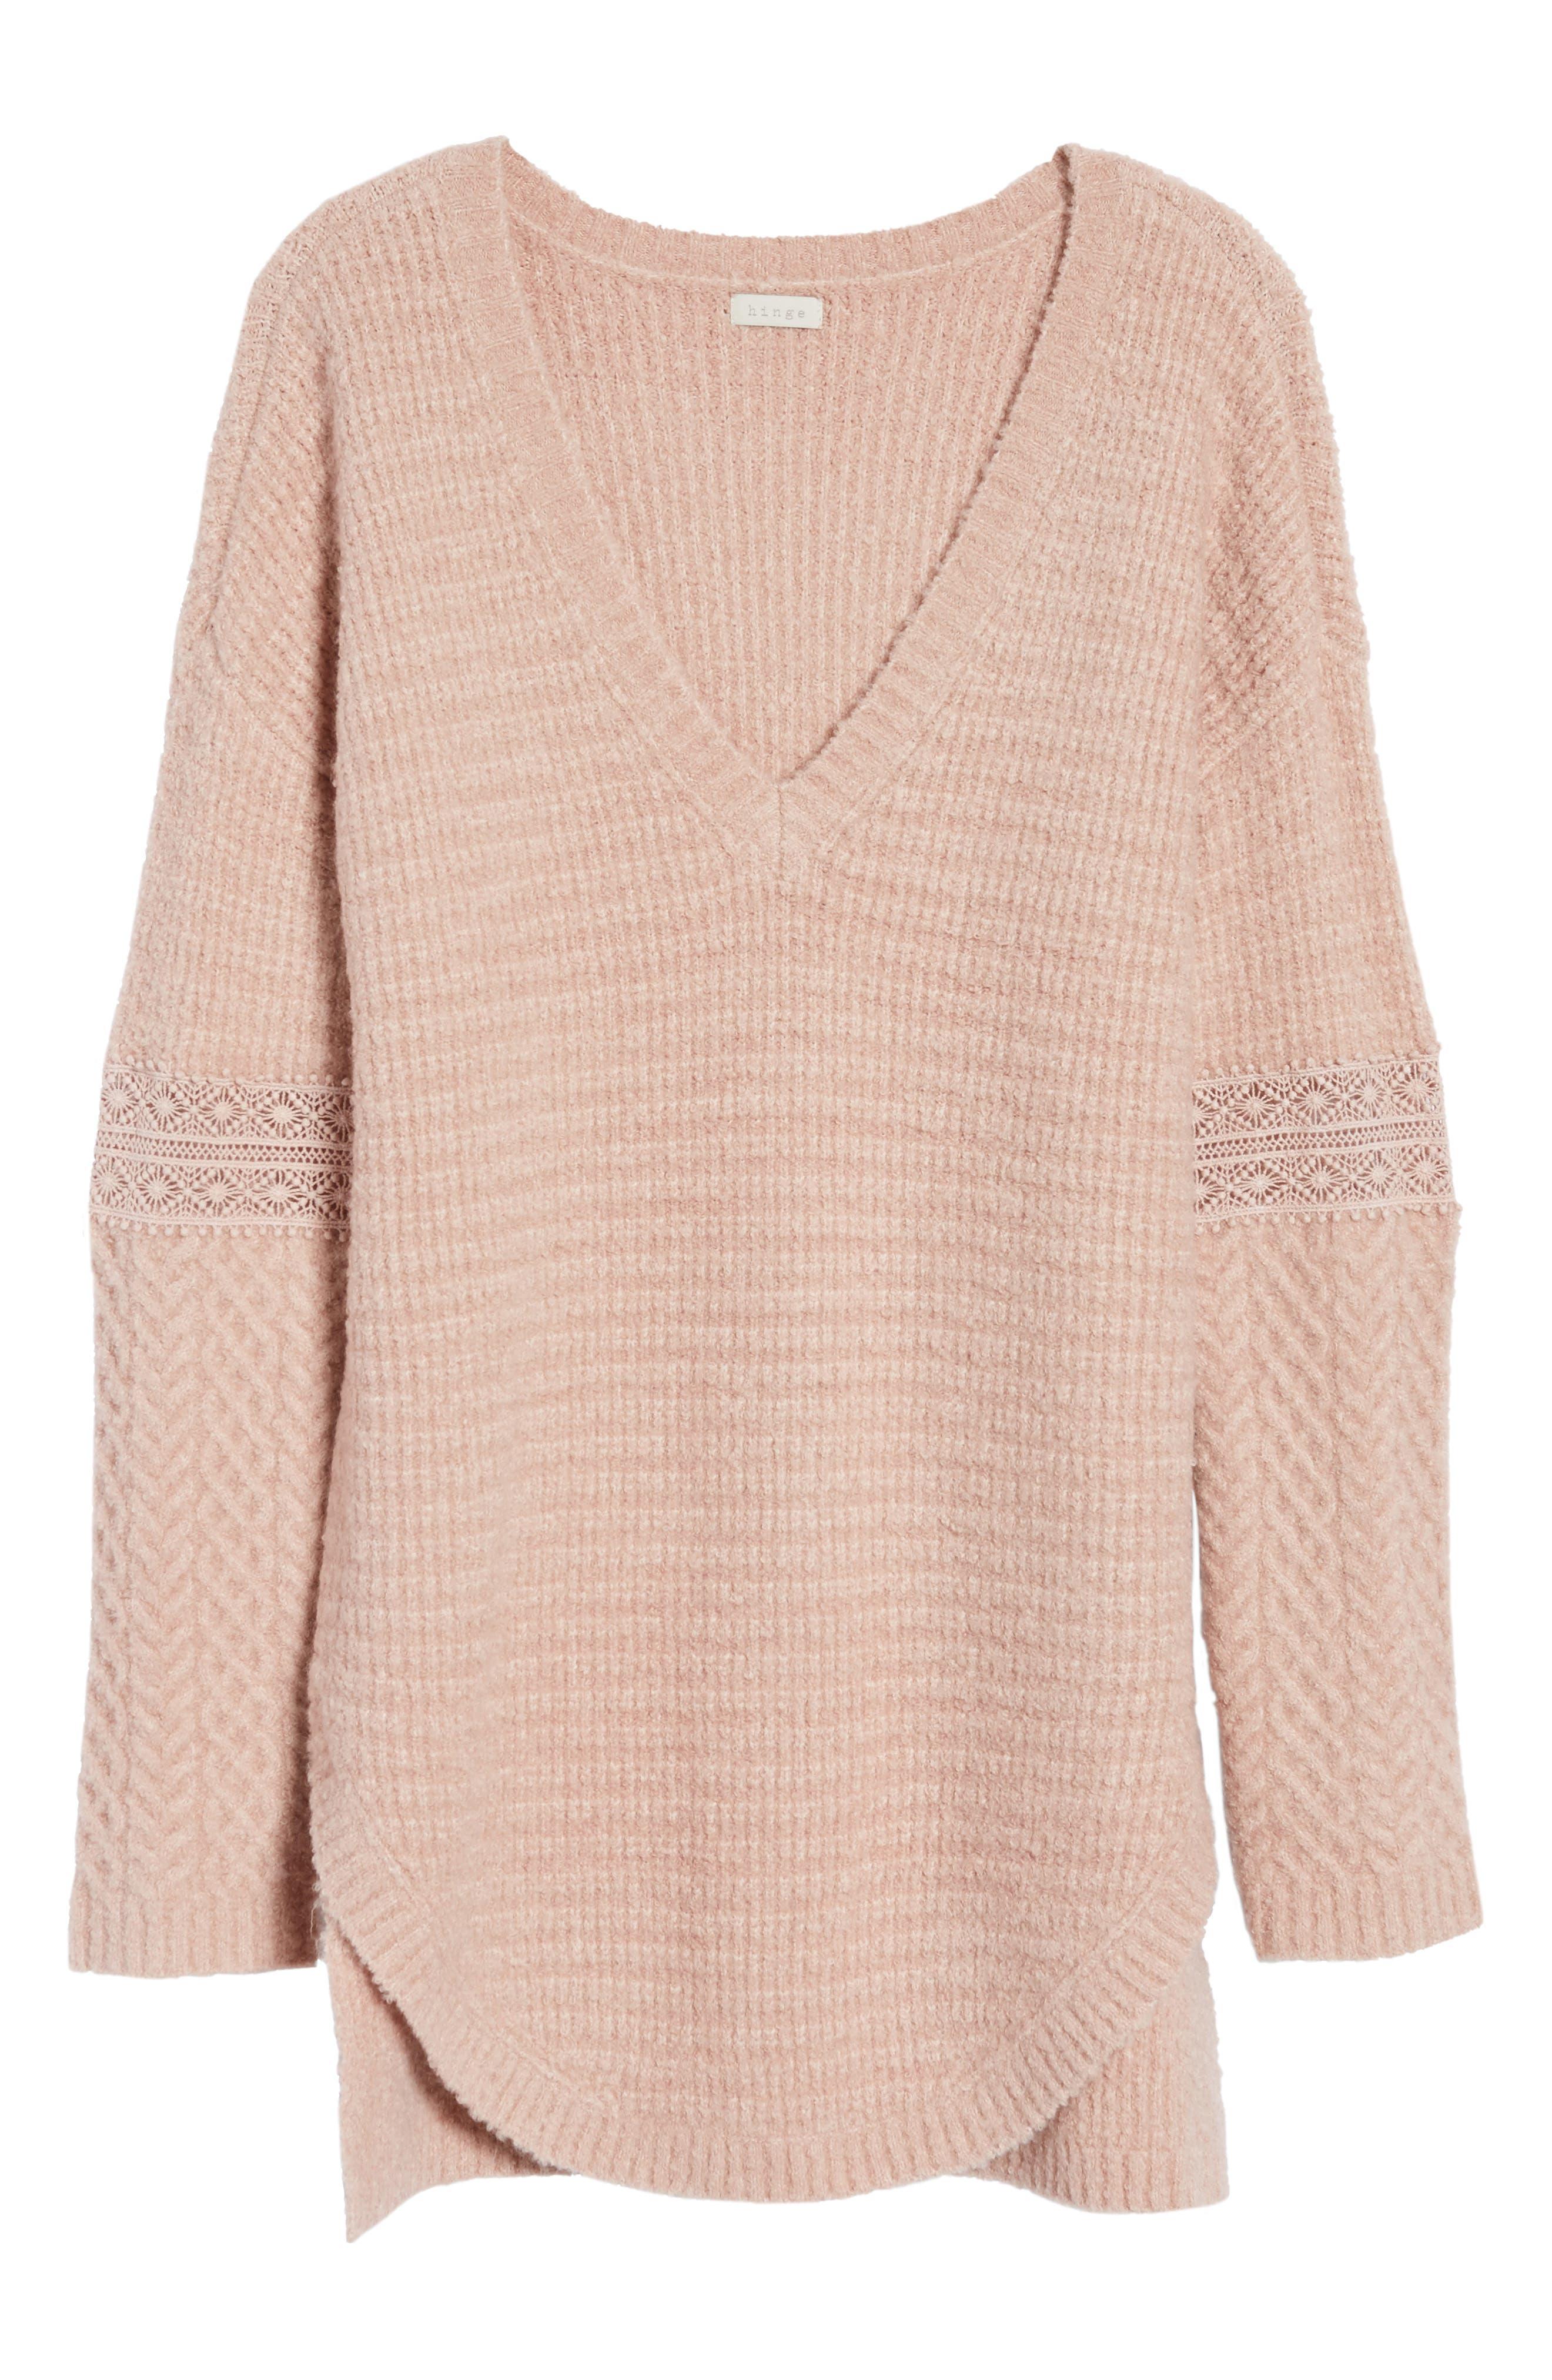 Lace Inset V-Neck Sweater,                             Alternate thumbnail 6, color,                             650